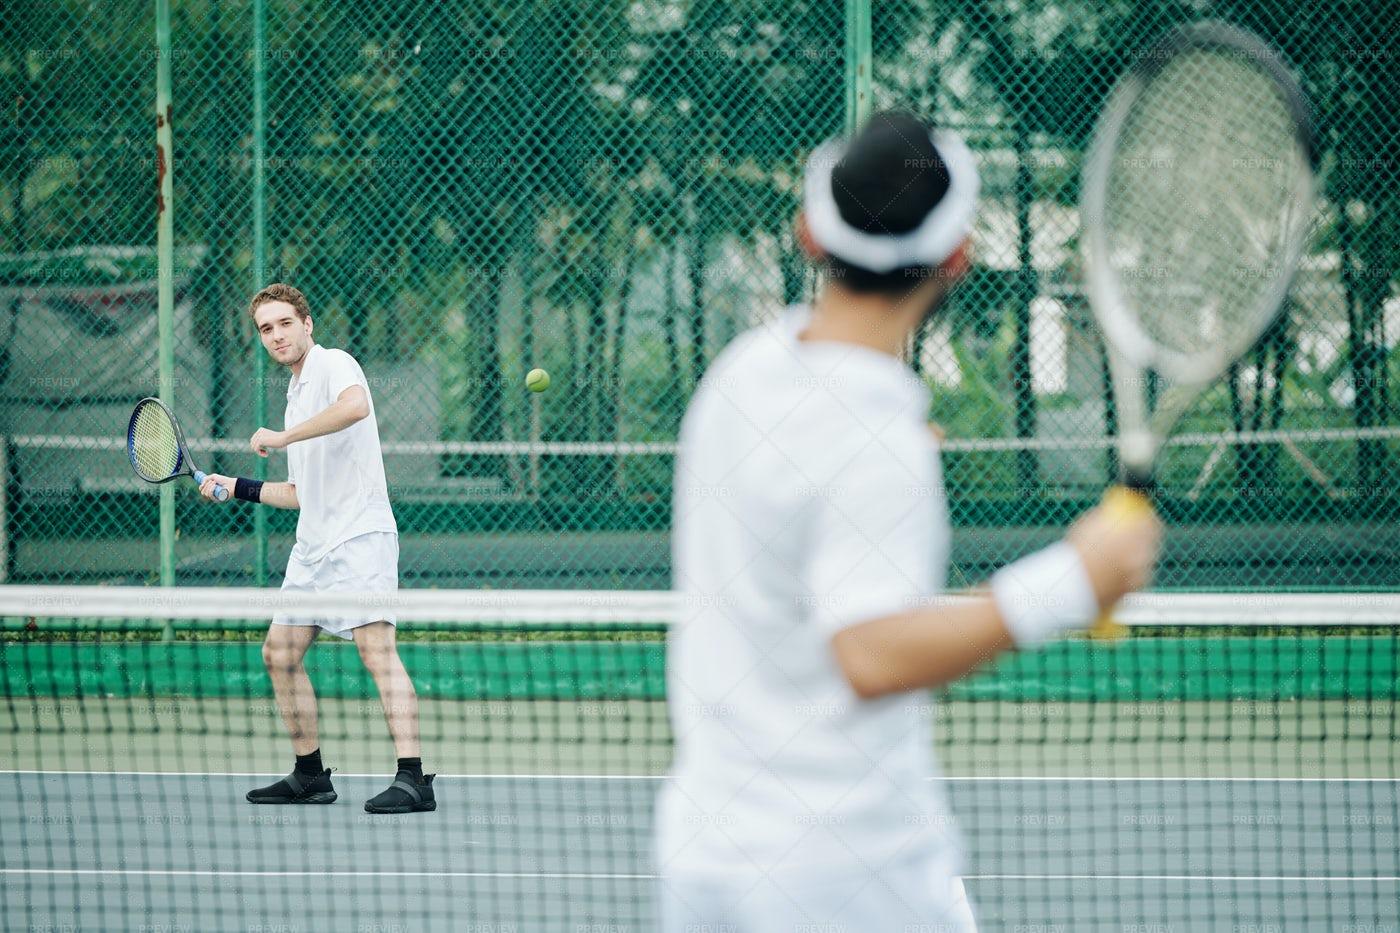 Tennis Game: Stock Photos